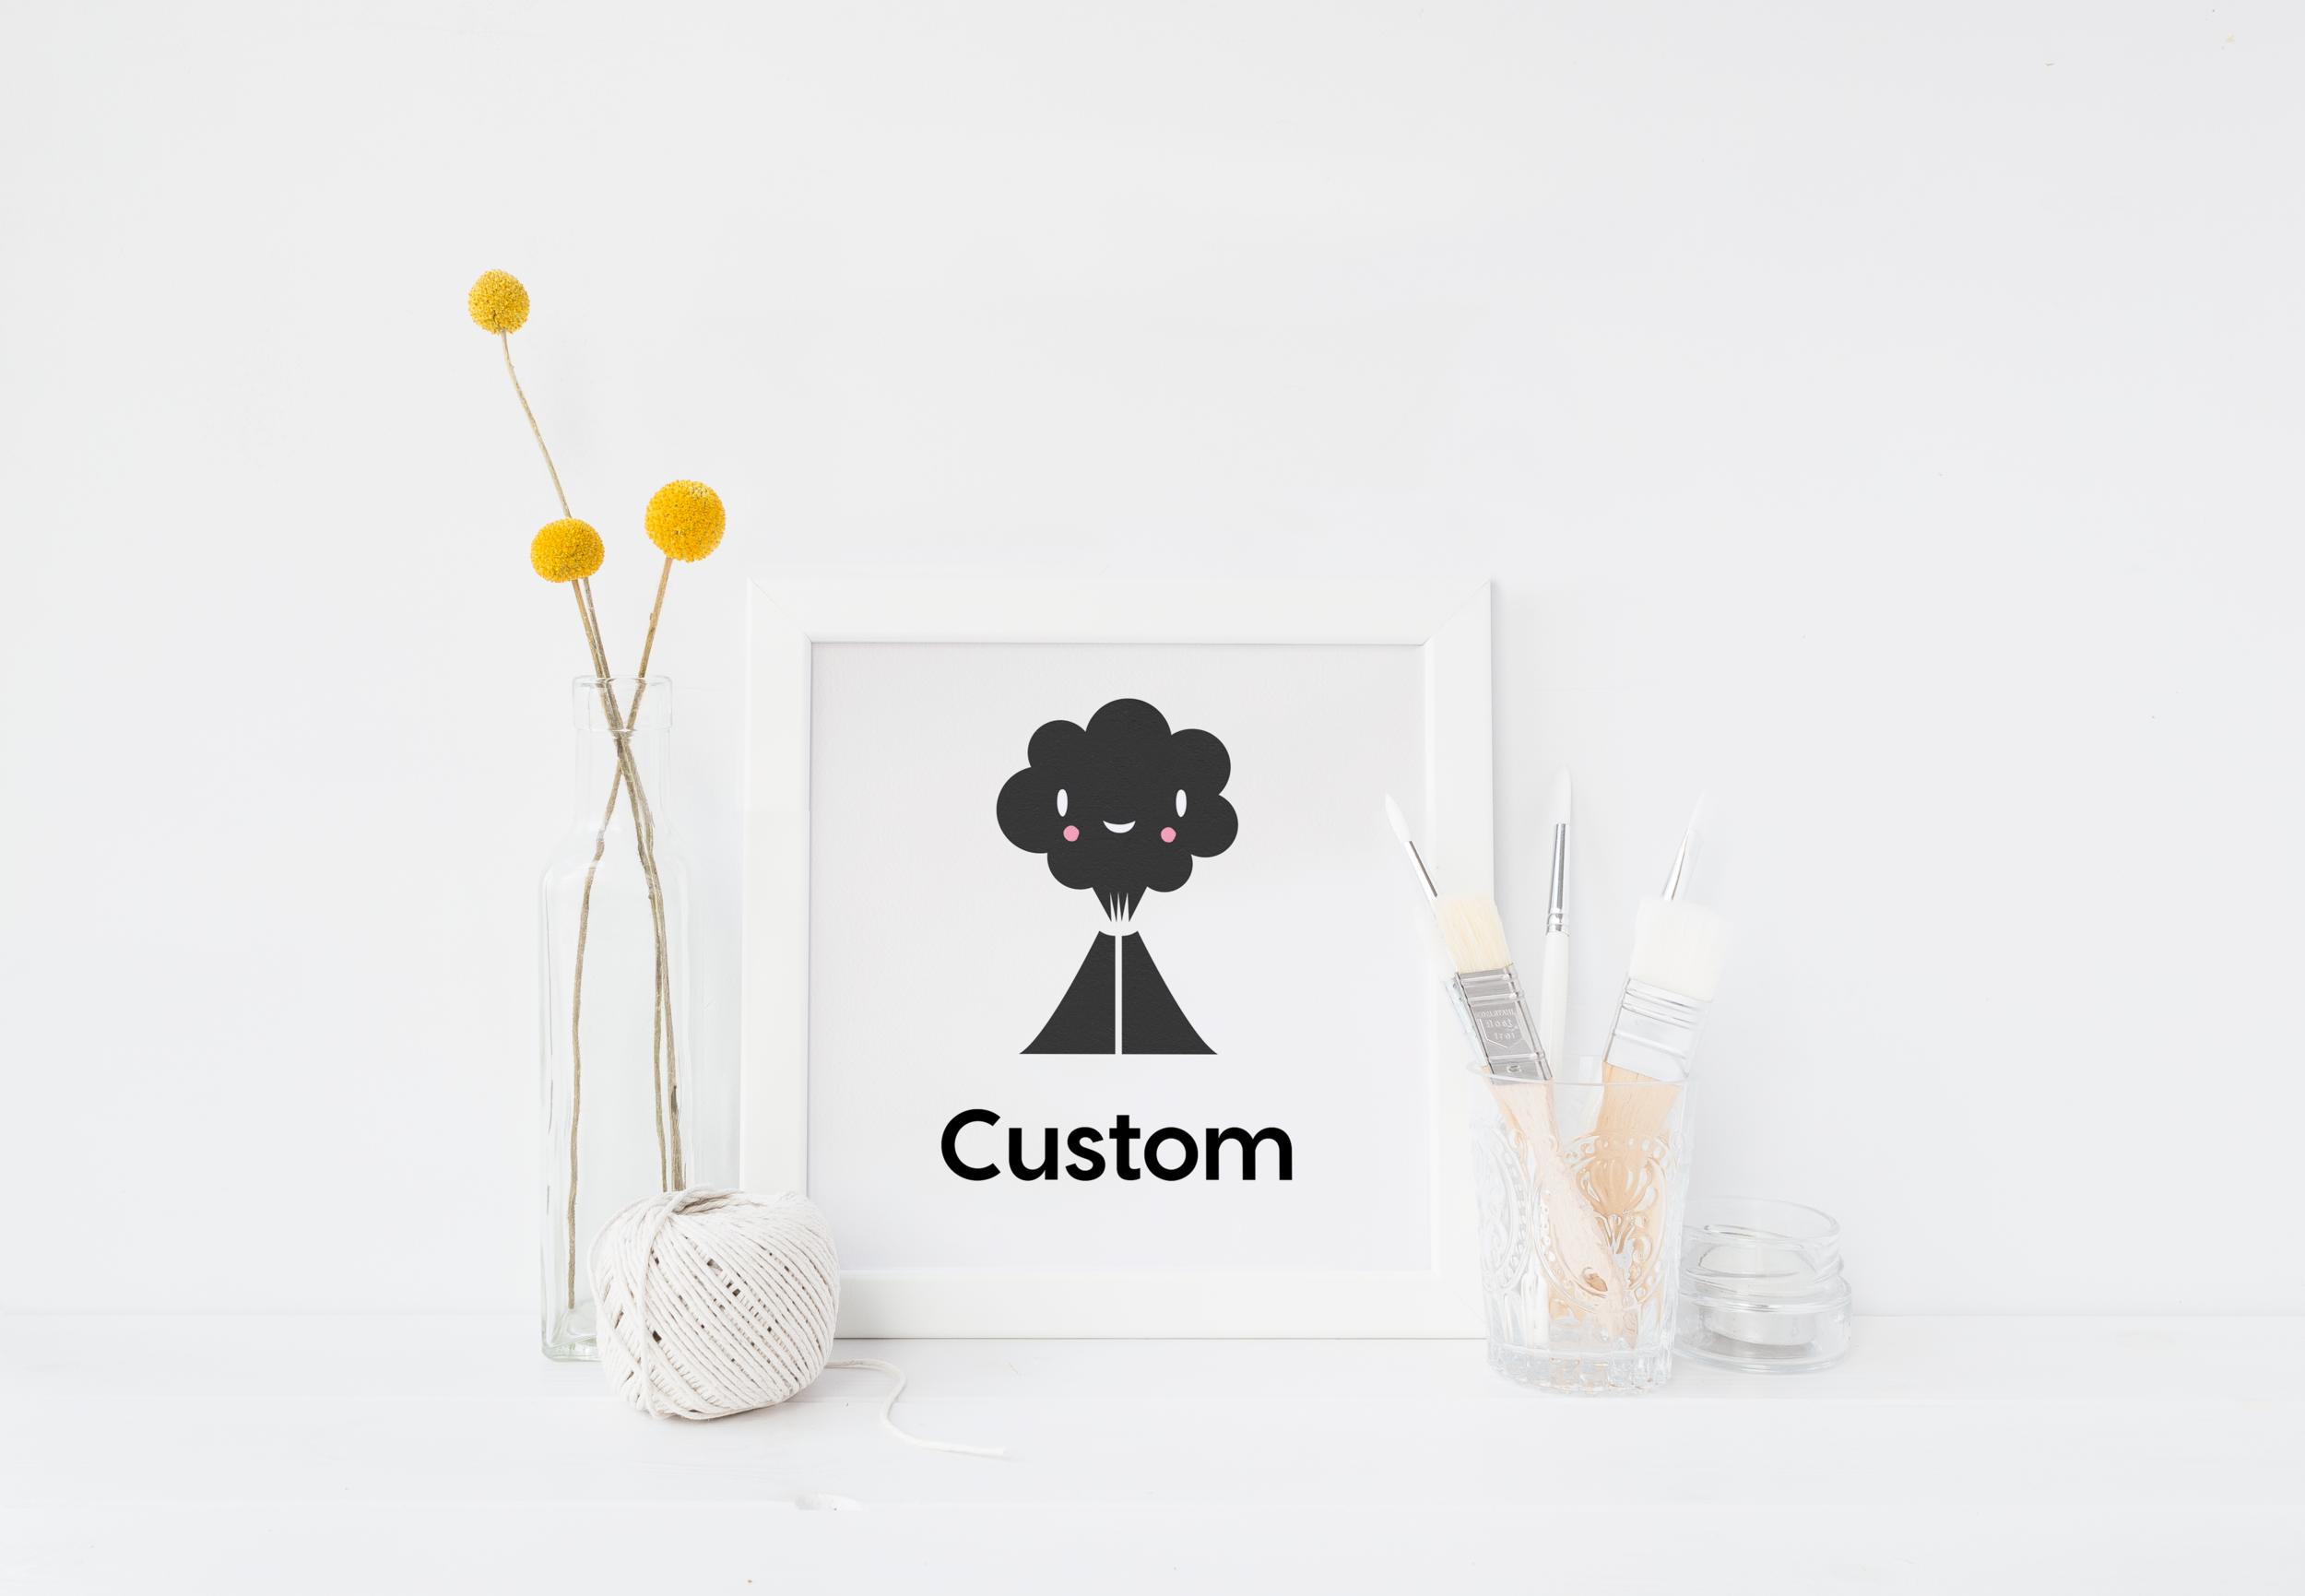 Custom - Prints (A4, A3 and A2)